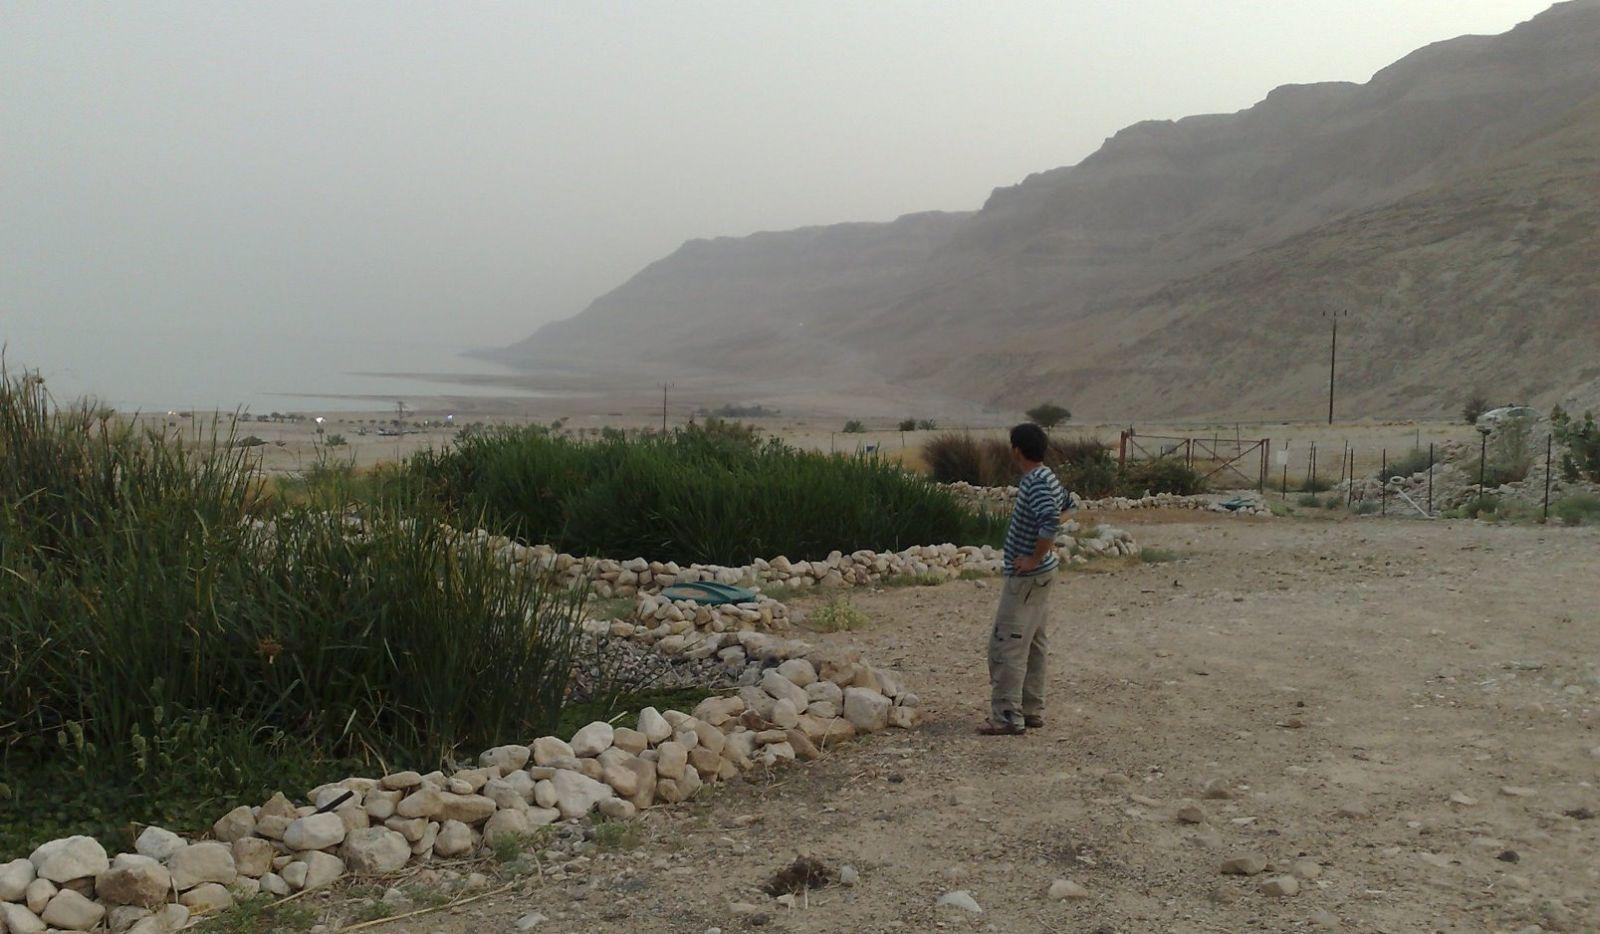 Ayala installations outside the Ahava cosmetics factory at the Dead Sea. Photo: courtesy